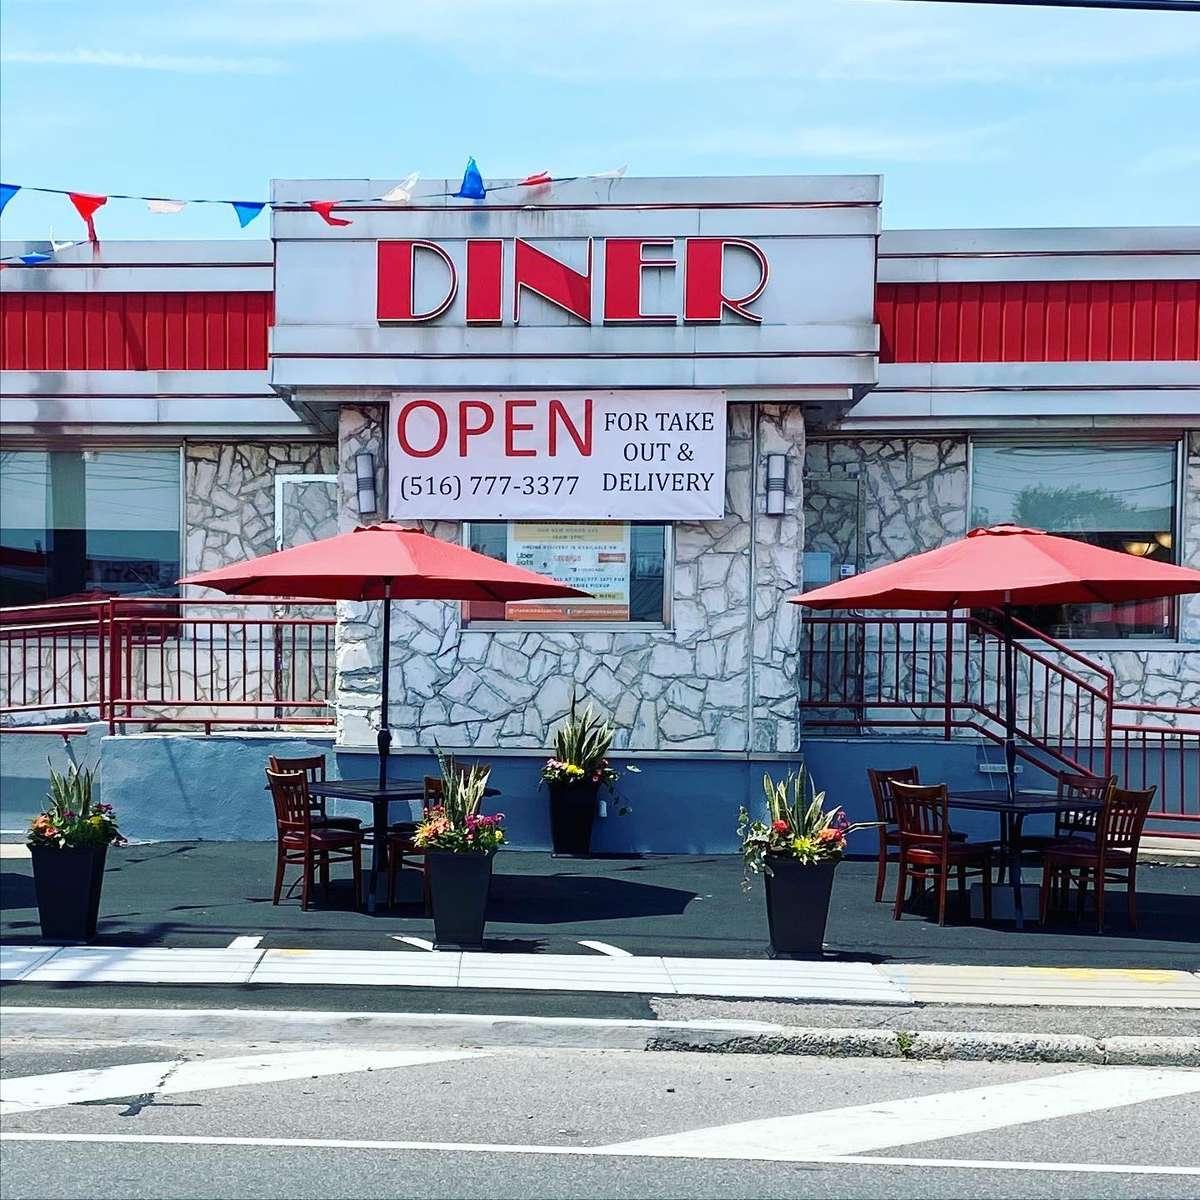 Diner exterior